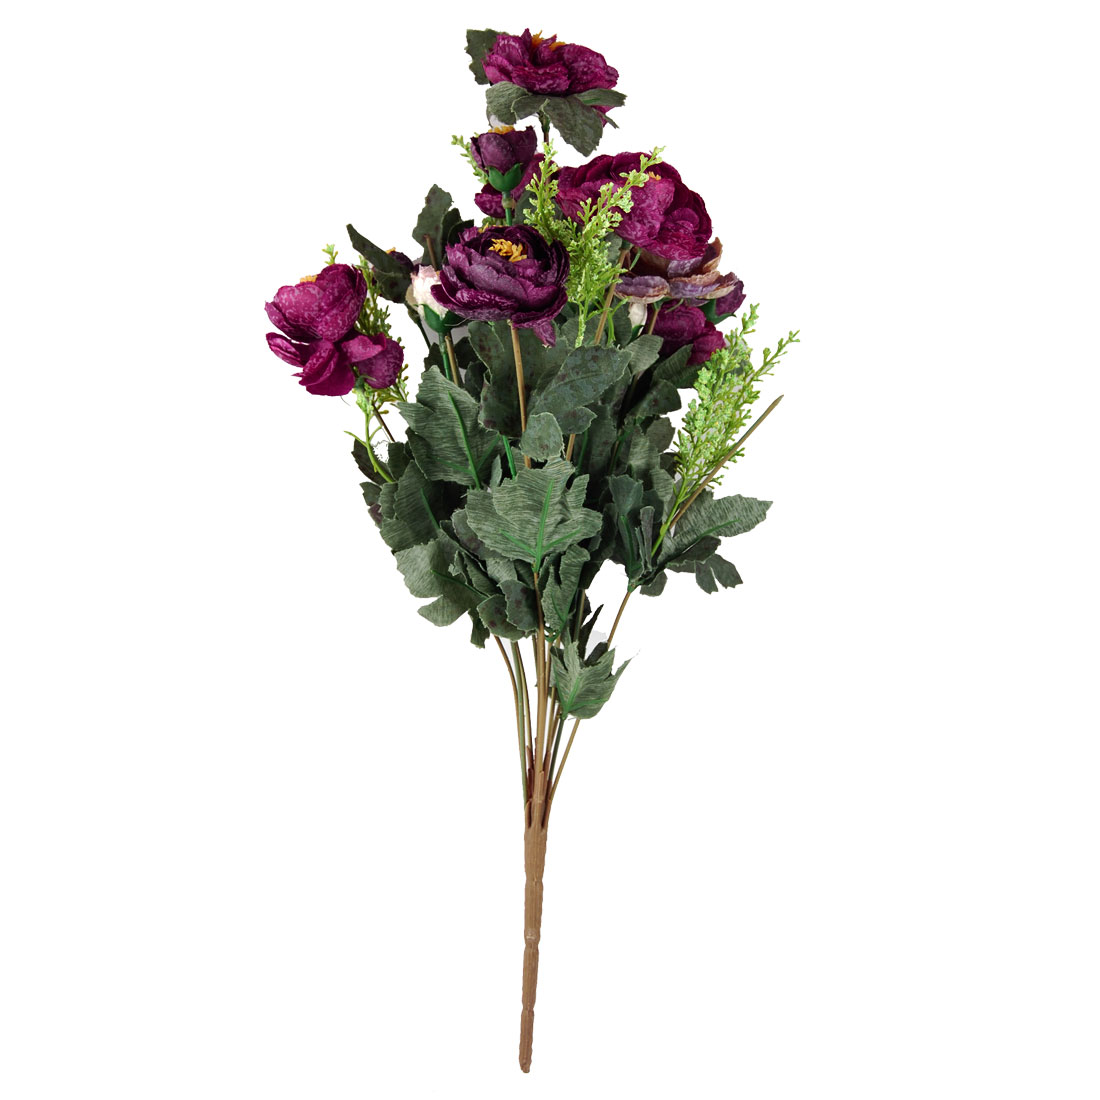 Blooming Artificial 11 Burgundy Camellia Flower Home Decor Wedding Bouquet